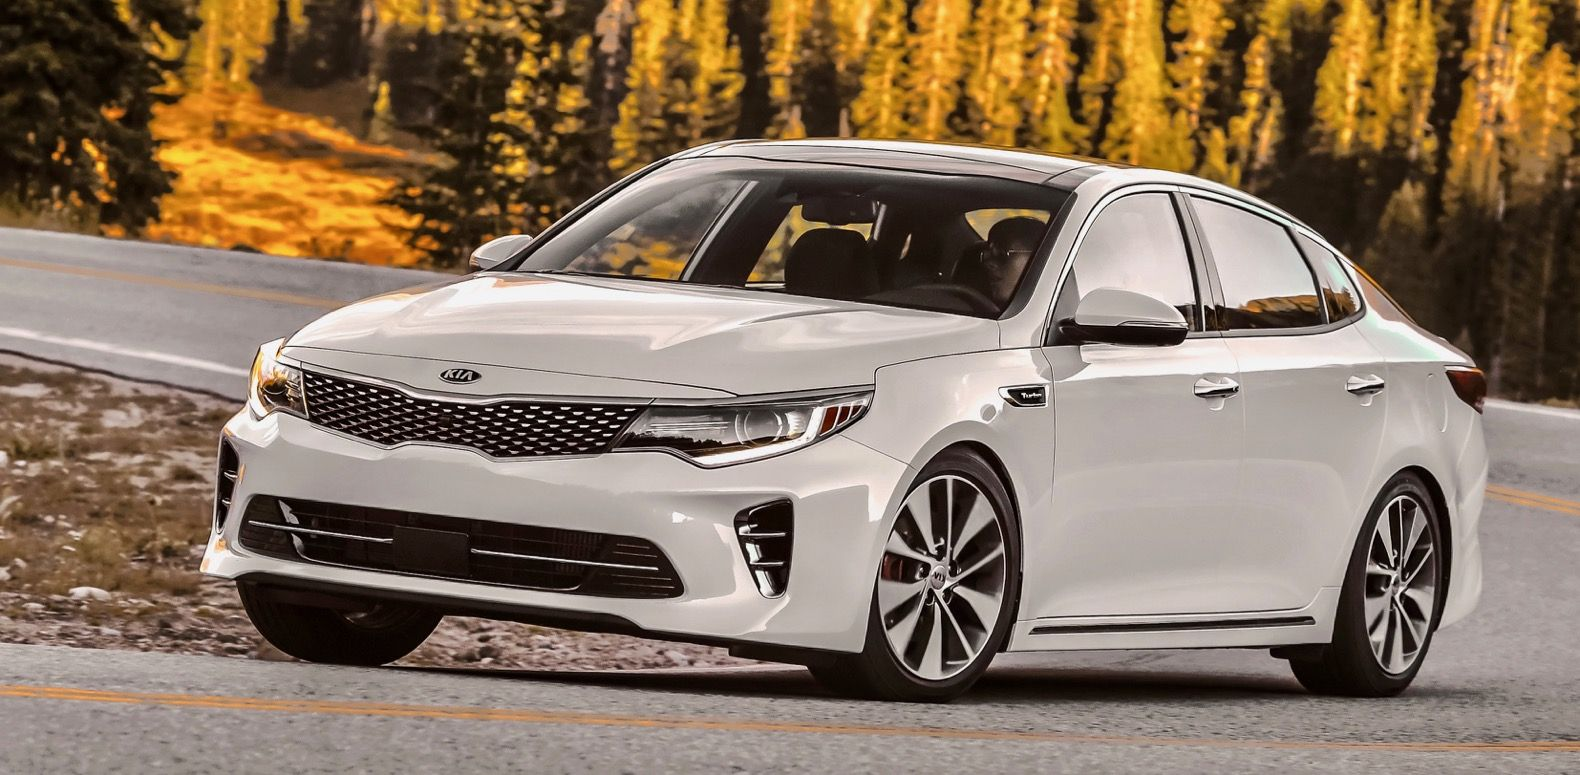 2017 kia optima Best family cars, Best new cars, Kia optima